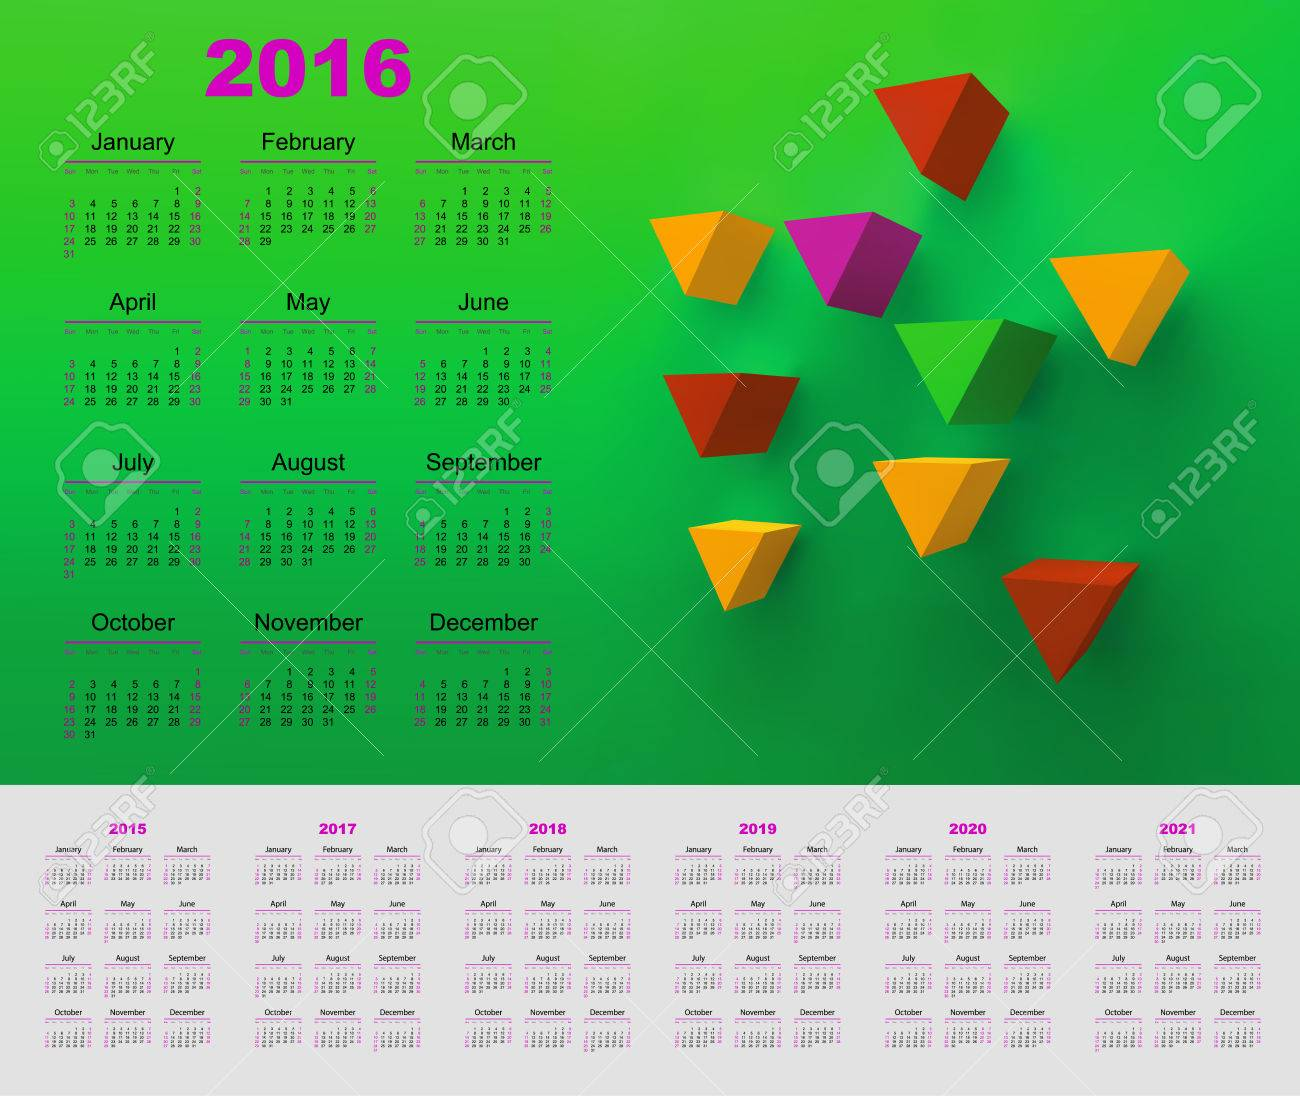 2016 2022 2023 Calendar.Calendar 2015 2016 2017 2018 2019 2020 2021 2022 2023 Royalty Free Cliparts Vectors And Stock Illustration Image 38150034